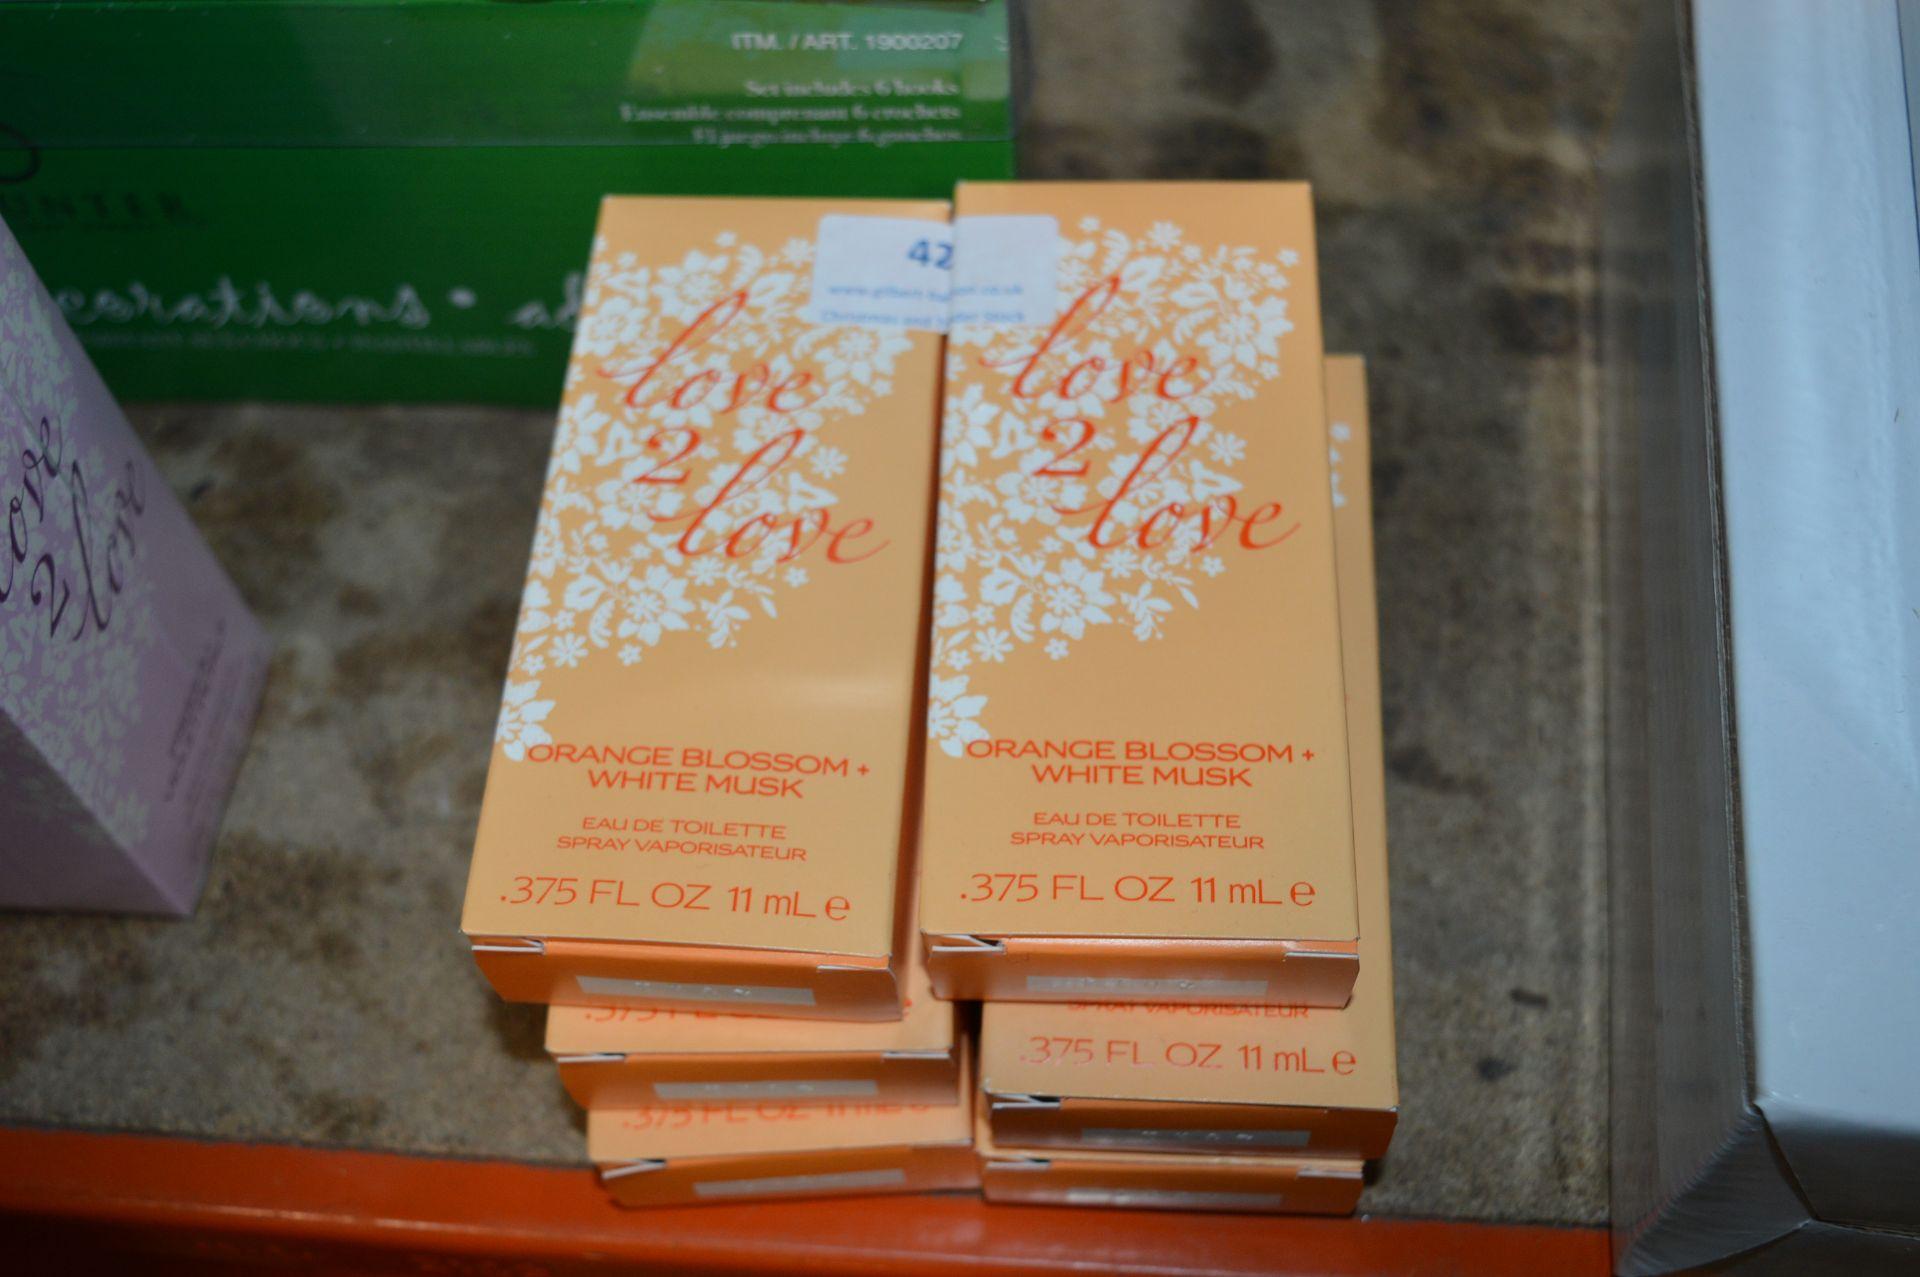 Lot 42 - *Love to Love Orange Blossom & White Musk Spray x6